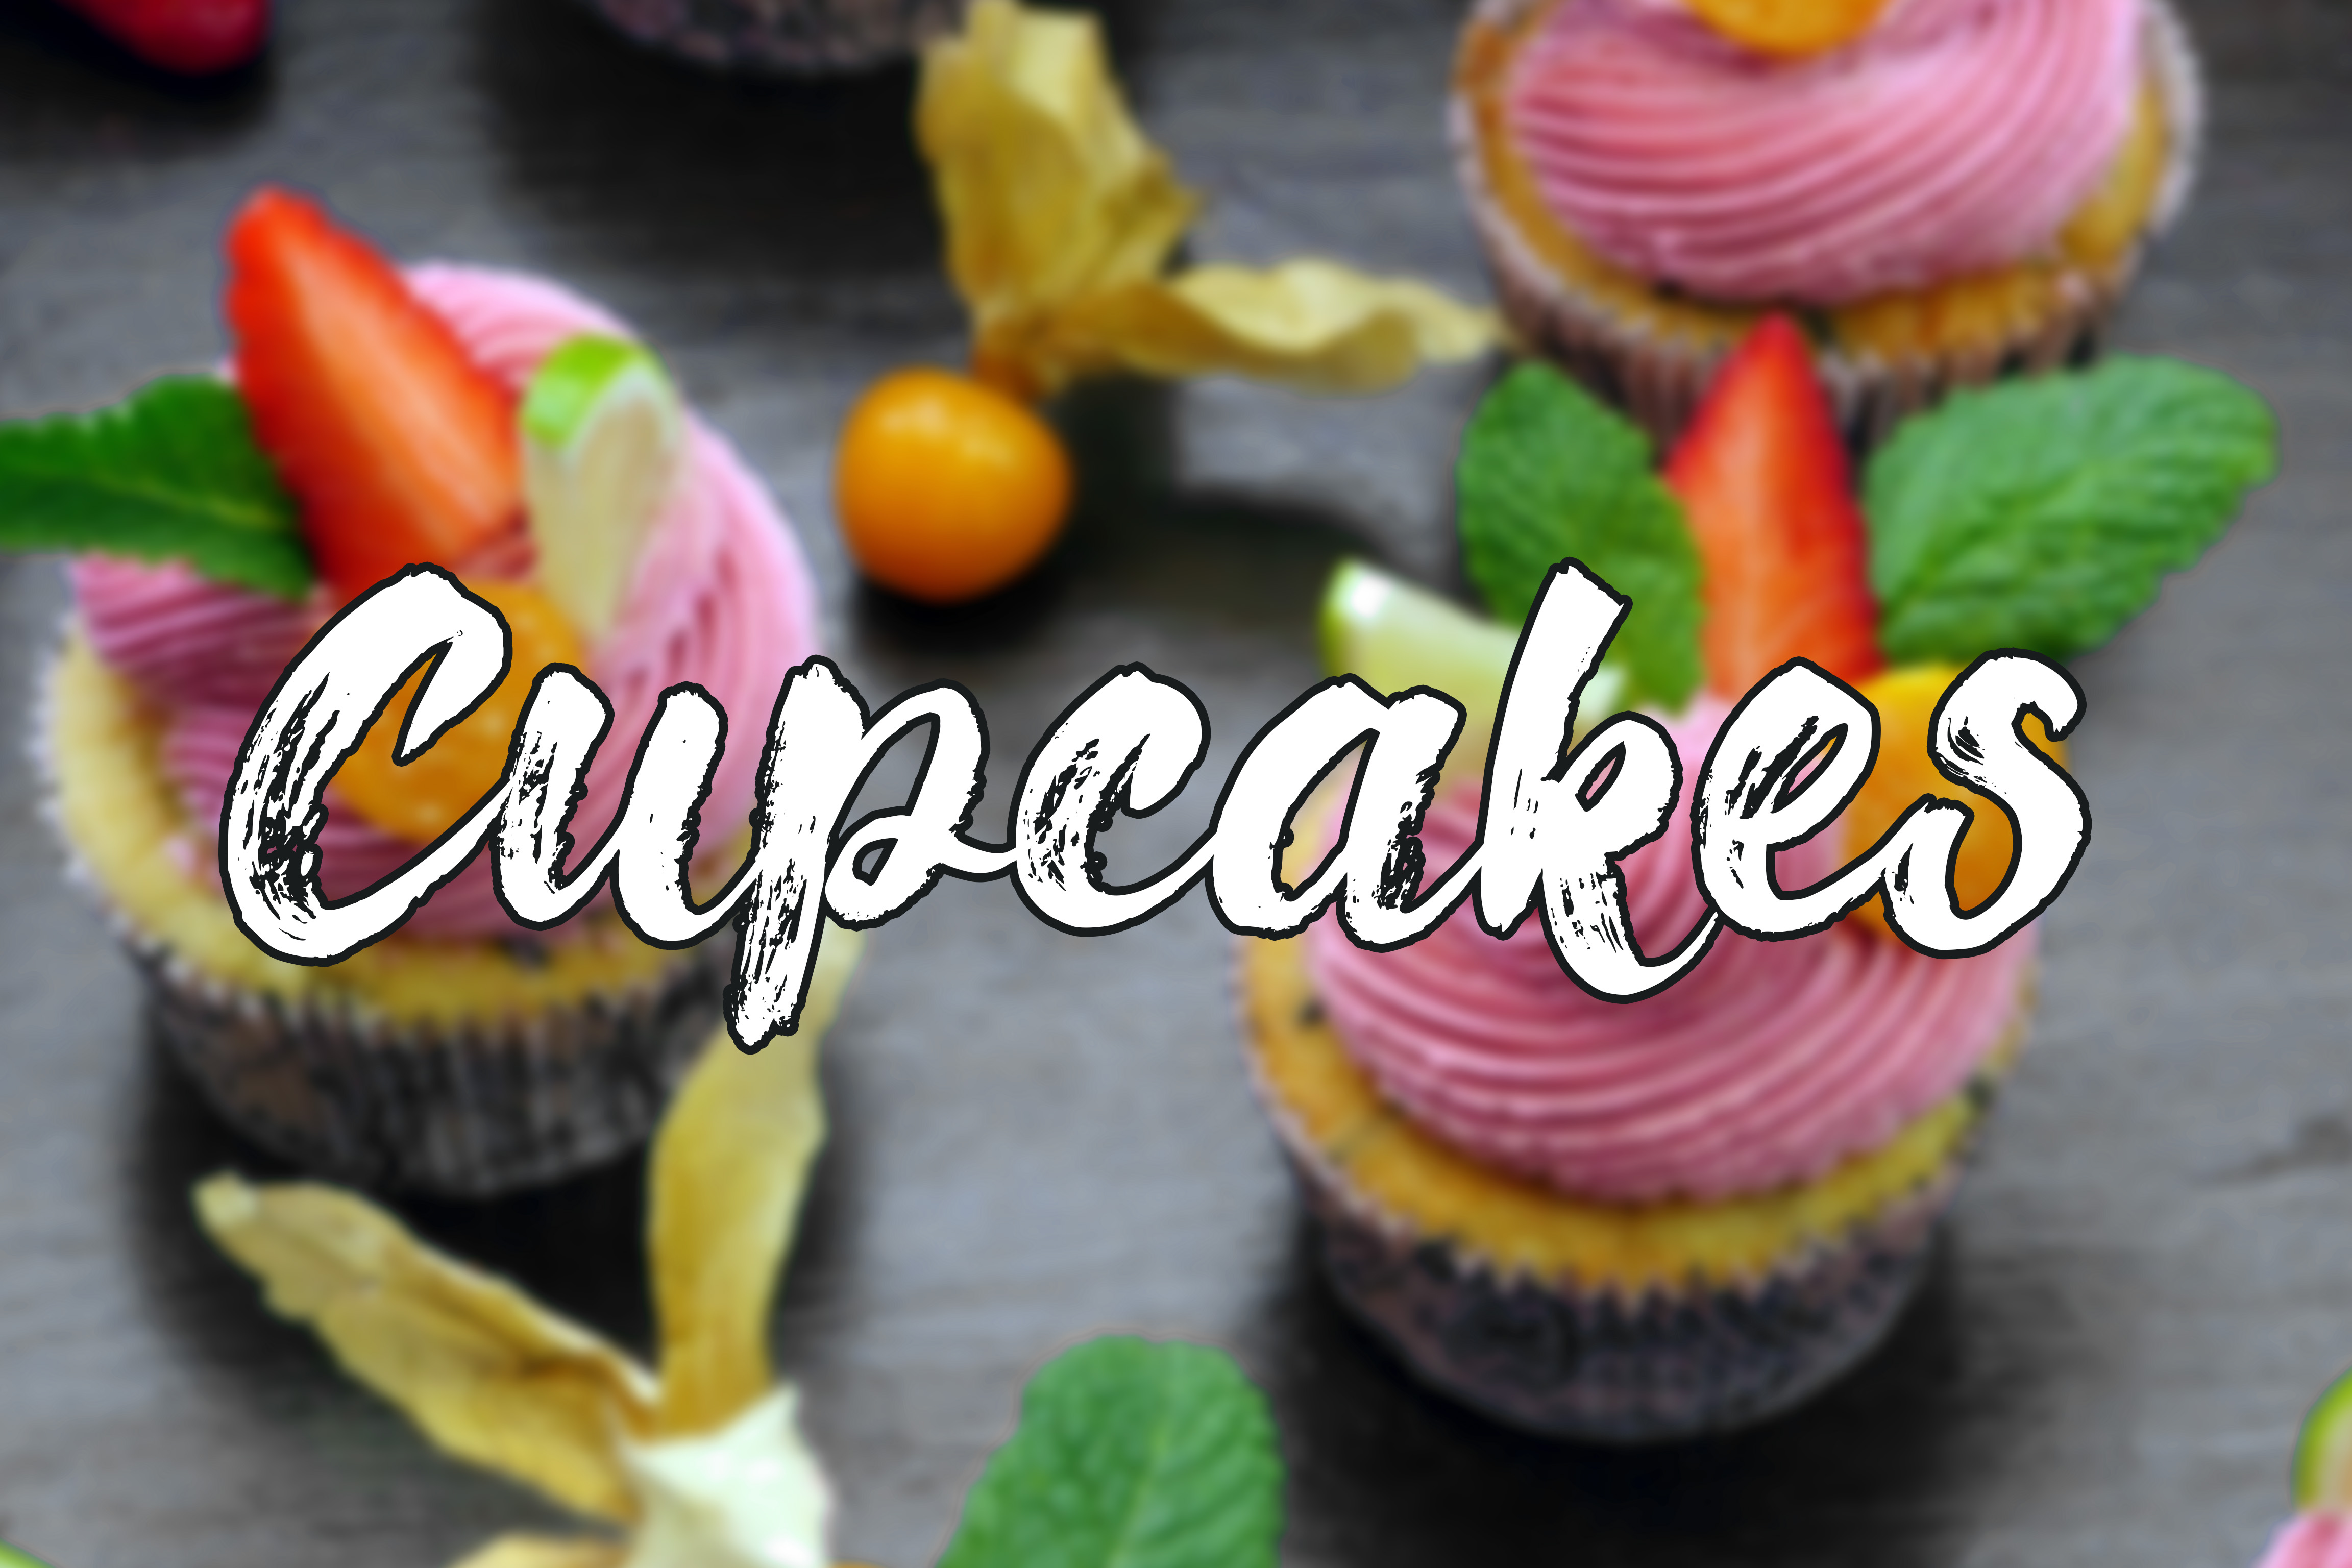 Cupcake Rezepte, Cupcakes selber machen, cupcakes dekorieren, cupcakes topping, muffins, mussin rezepte